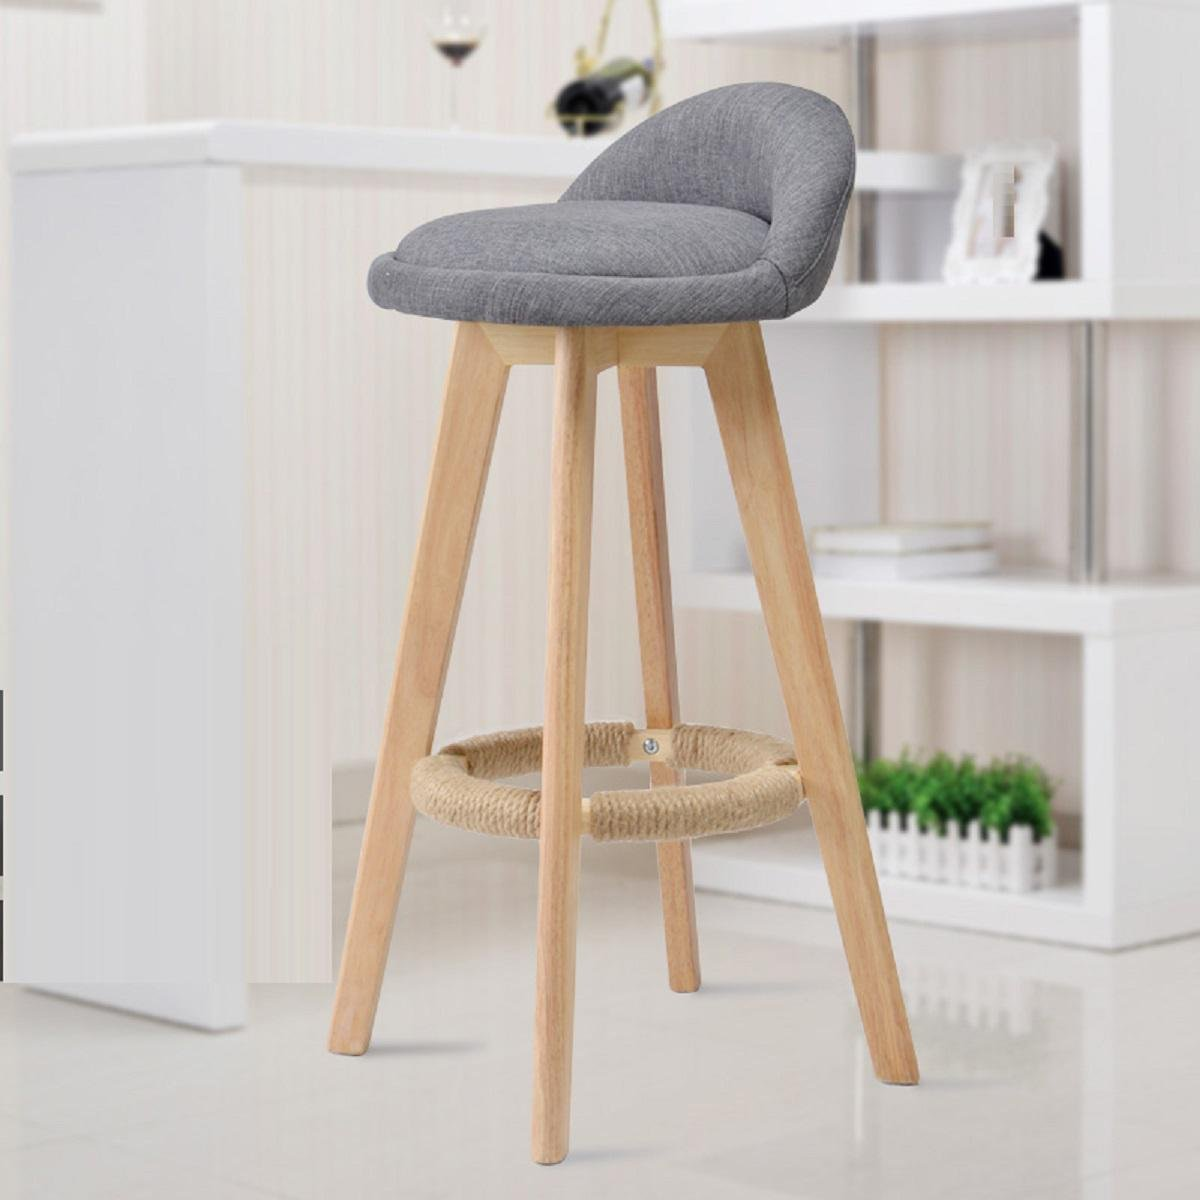 GAOJIAN Solid Wood Bar Chair Creative High Chair European Style Bar Chair Wood Front Desk Retro Bar Stool High Feet Stools , b by GAOJIAN